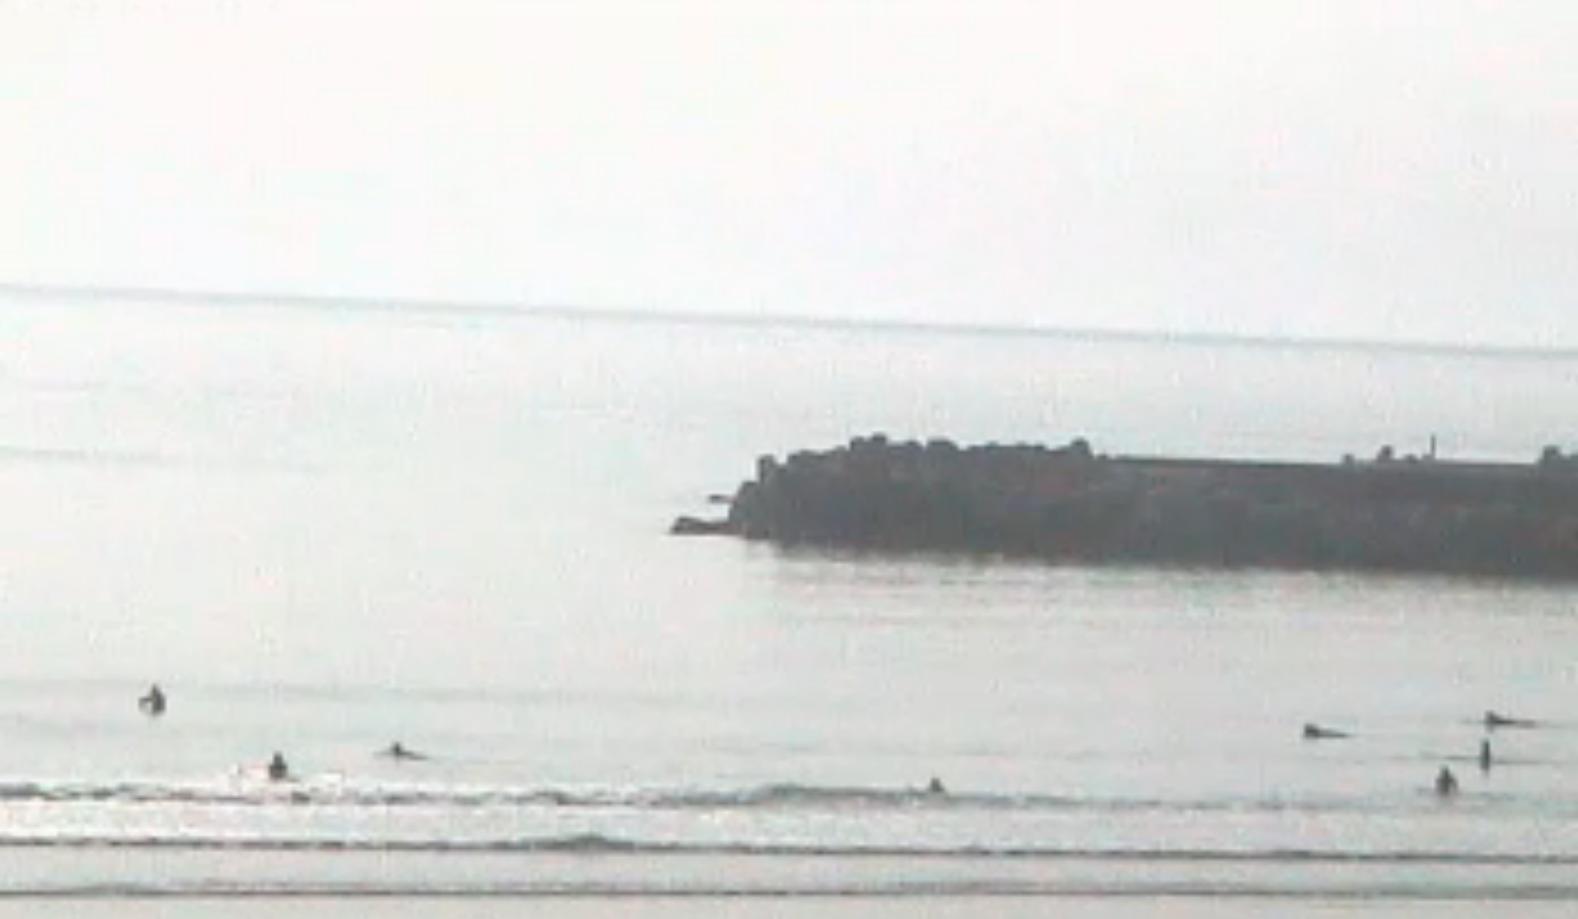 iinamiお倉ヶ浜ビーチライブカメラ(宮崎県日向市財光寺)